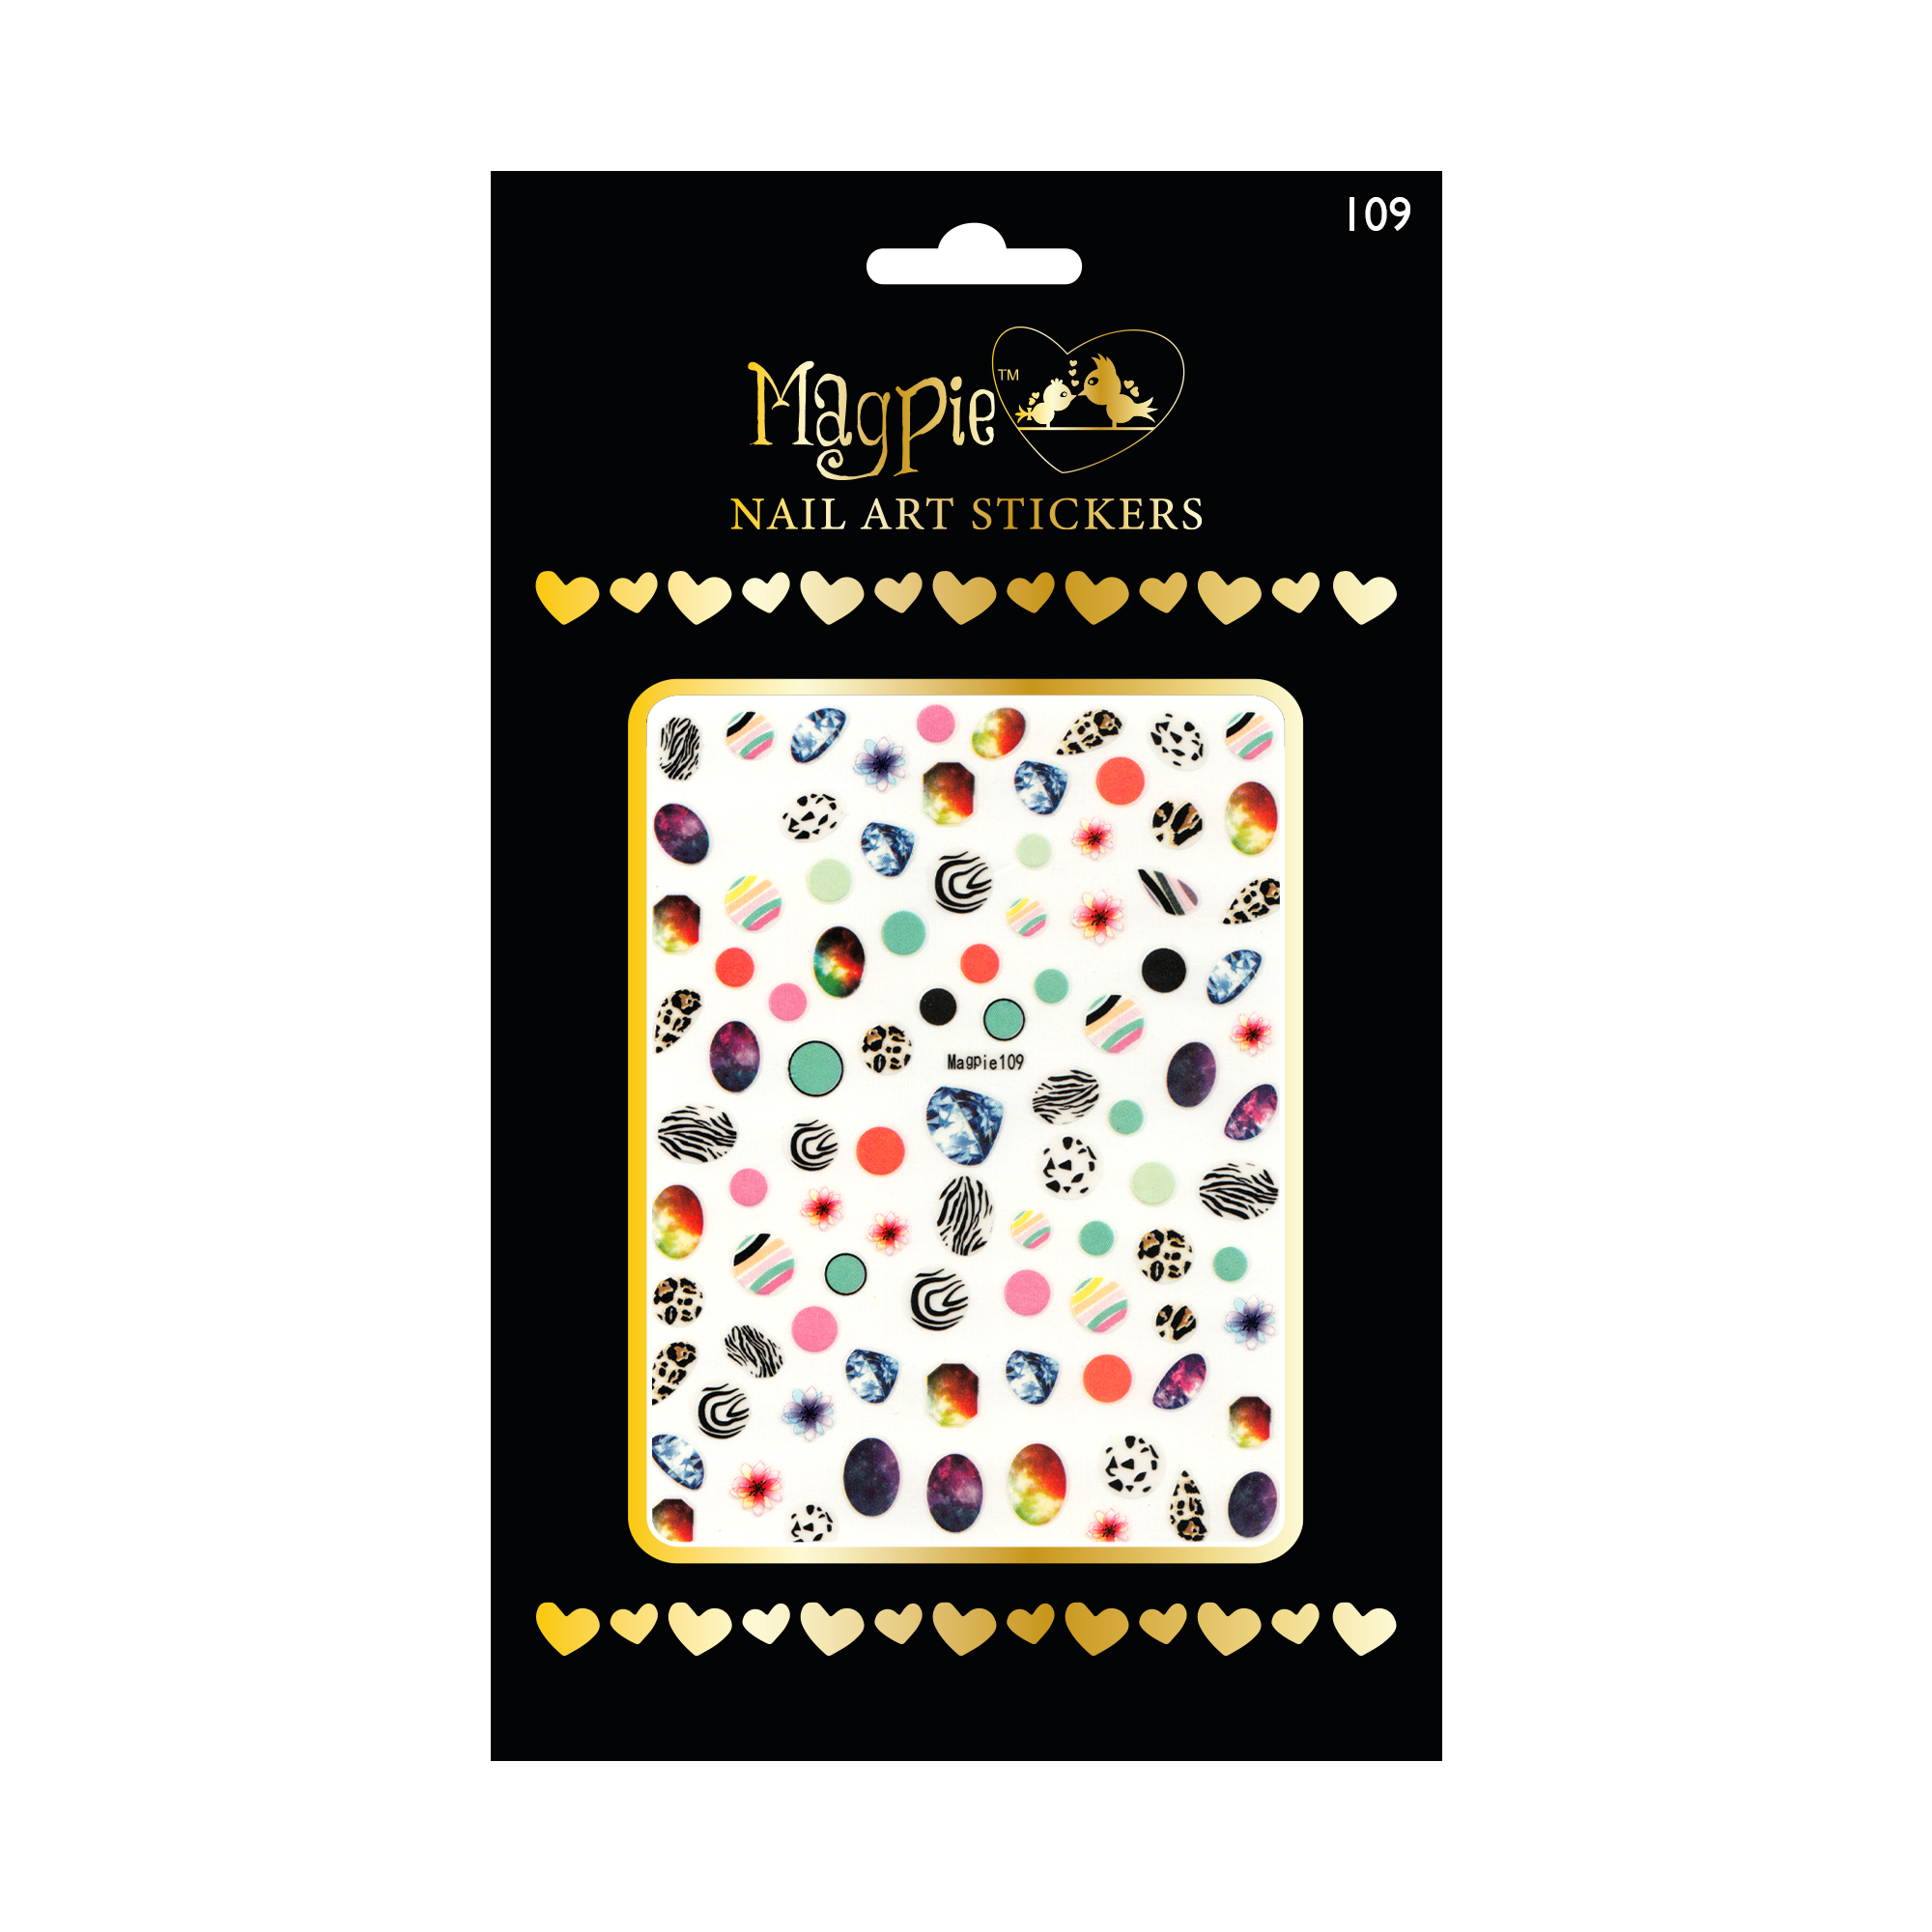 Magpie 109 stickers